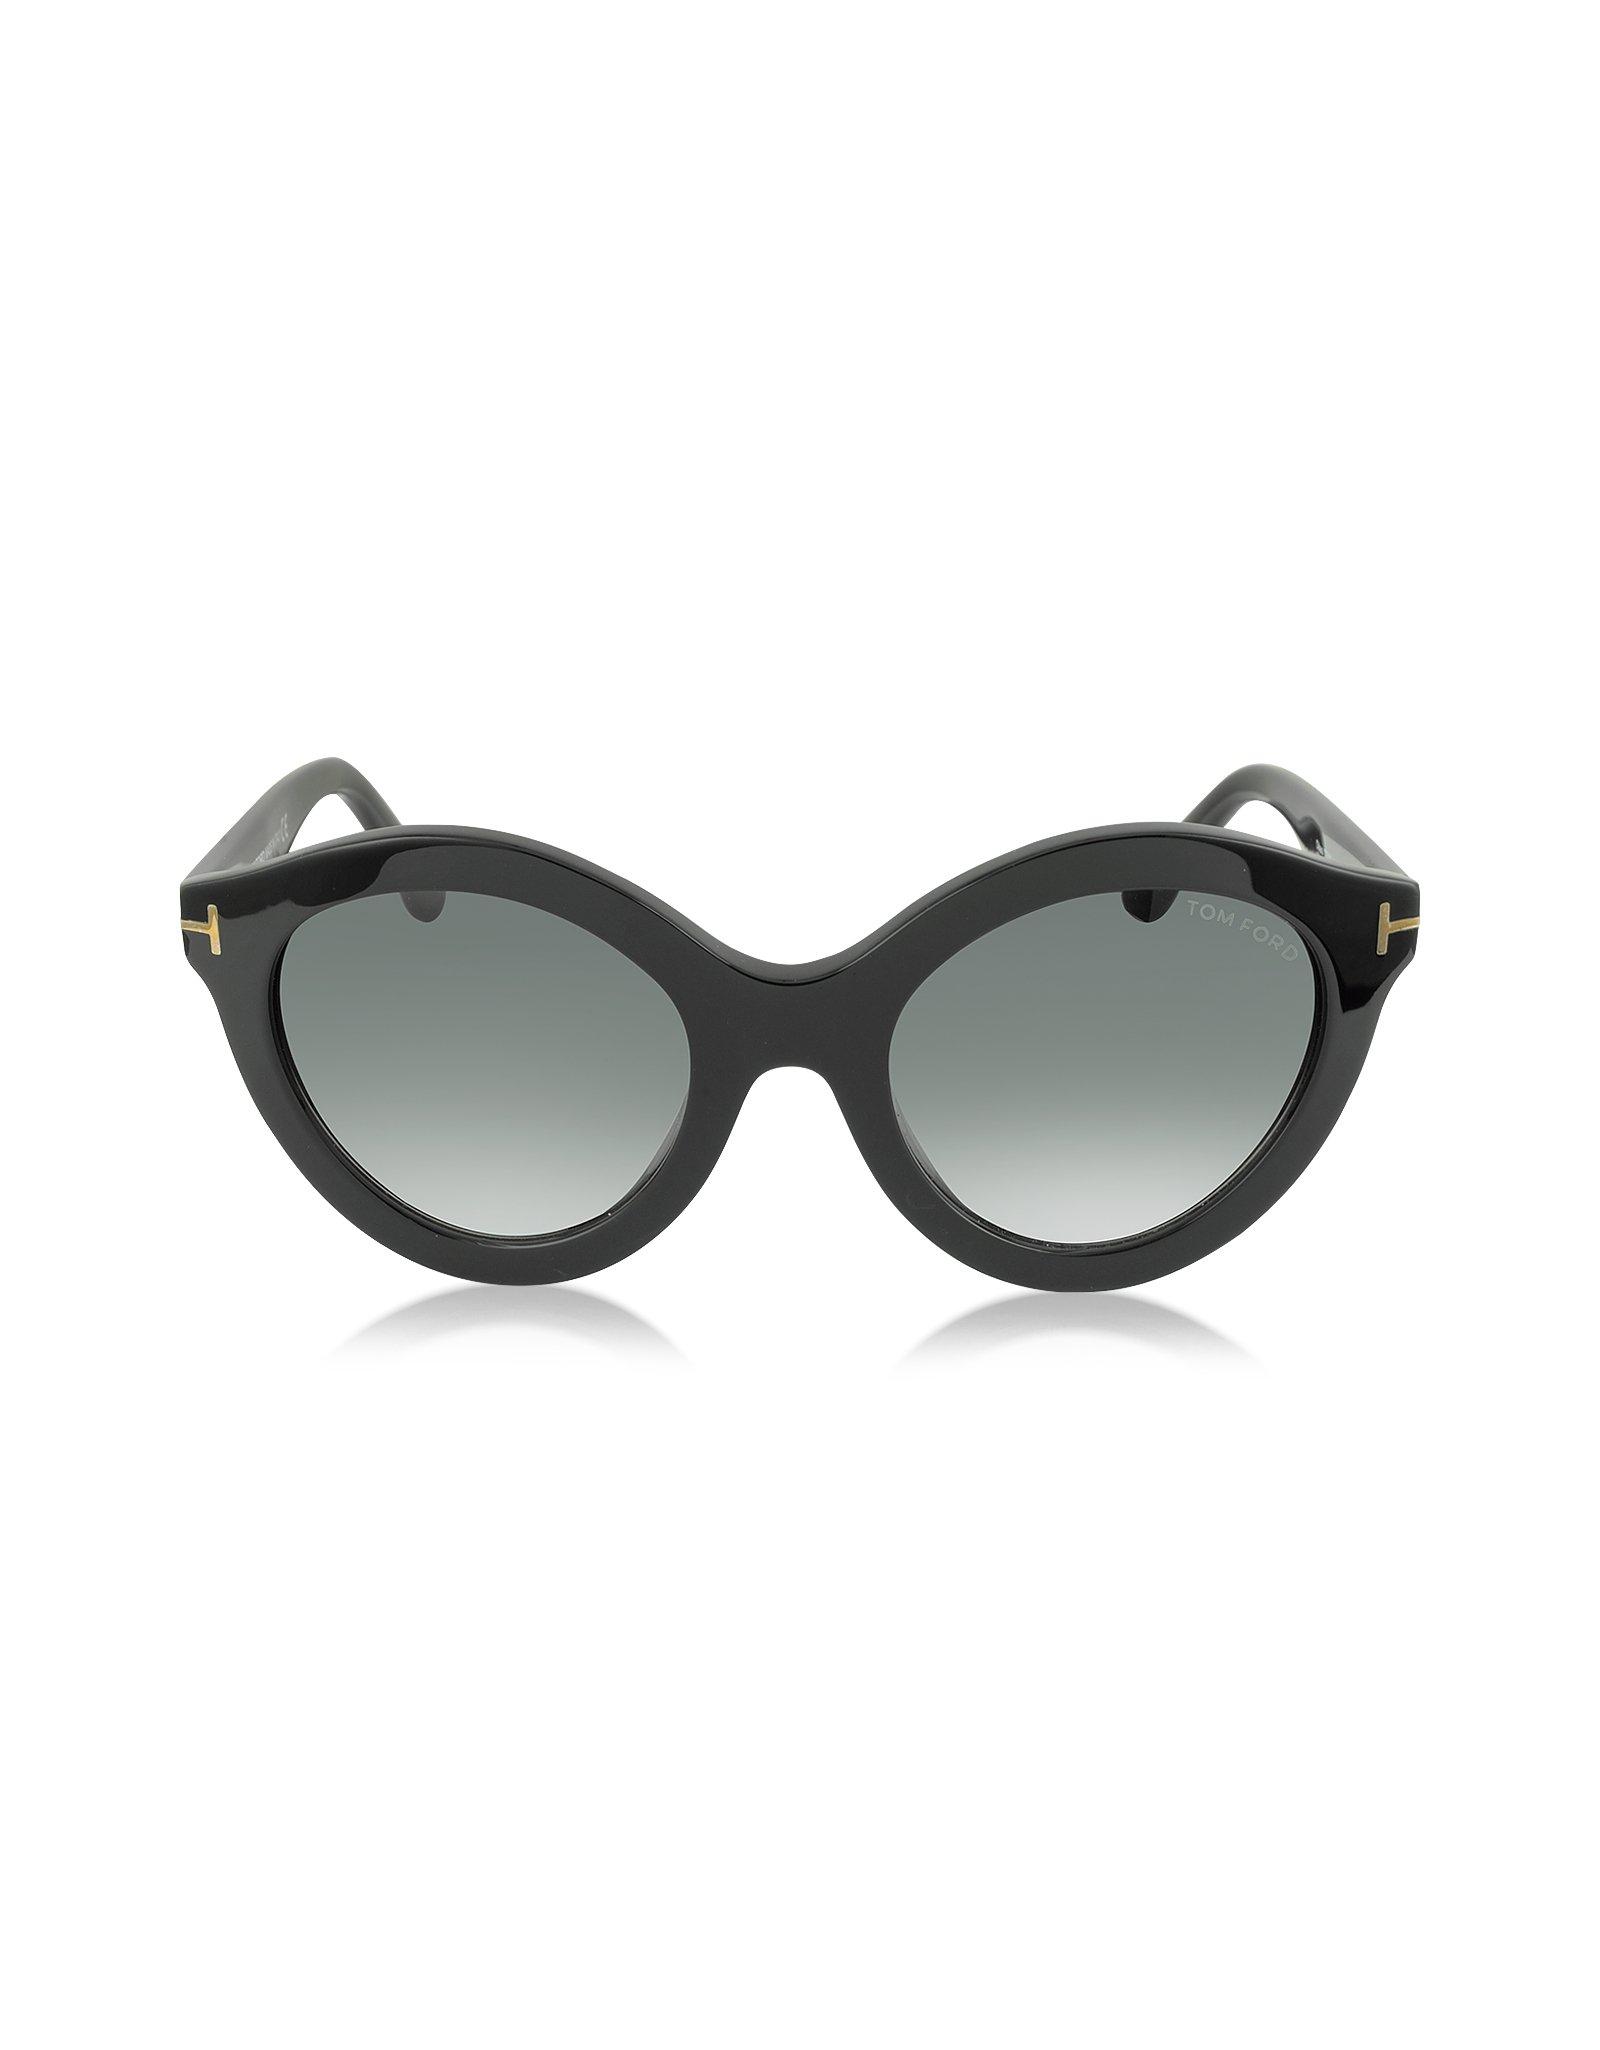 0bcaf1a02e6b Lyst - Tom Ford Chiara Ft0359 01b Black Round Sunglasses in Black